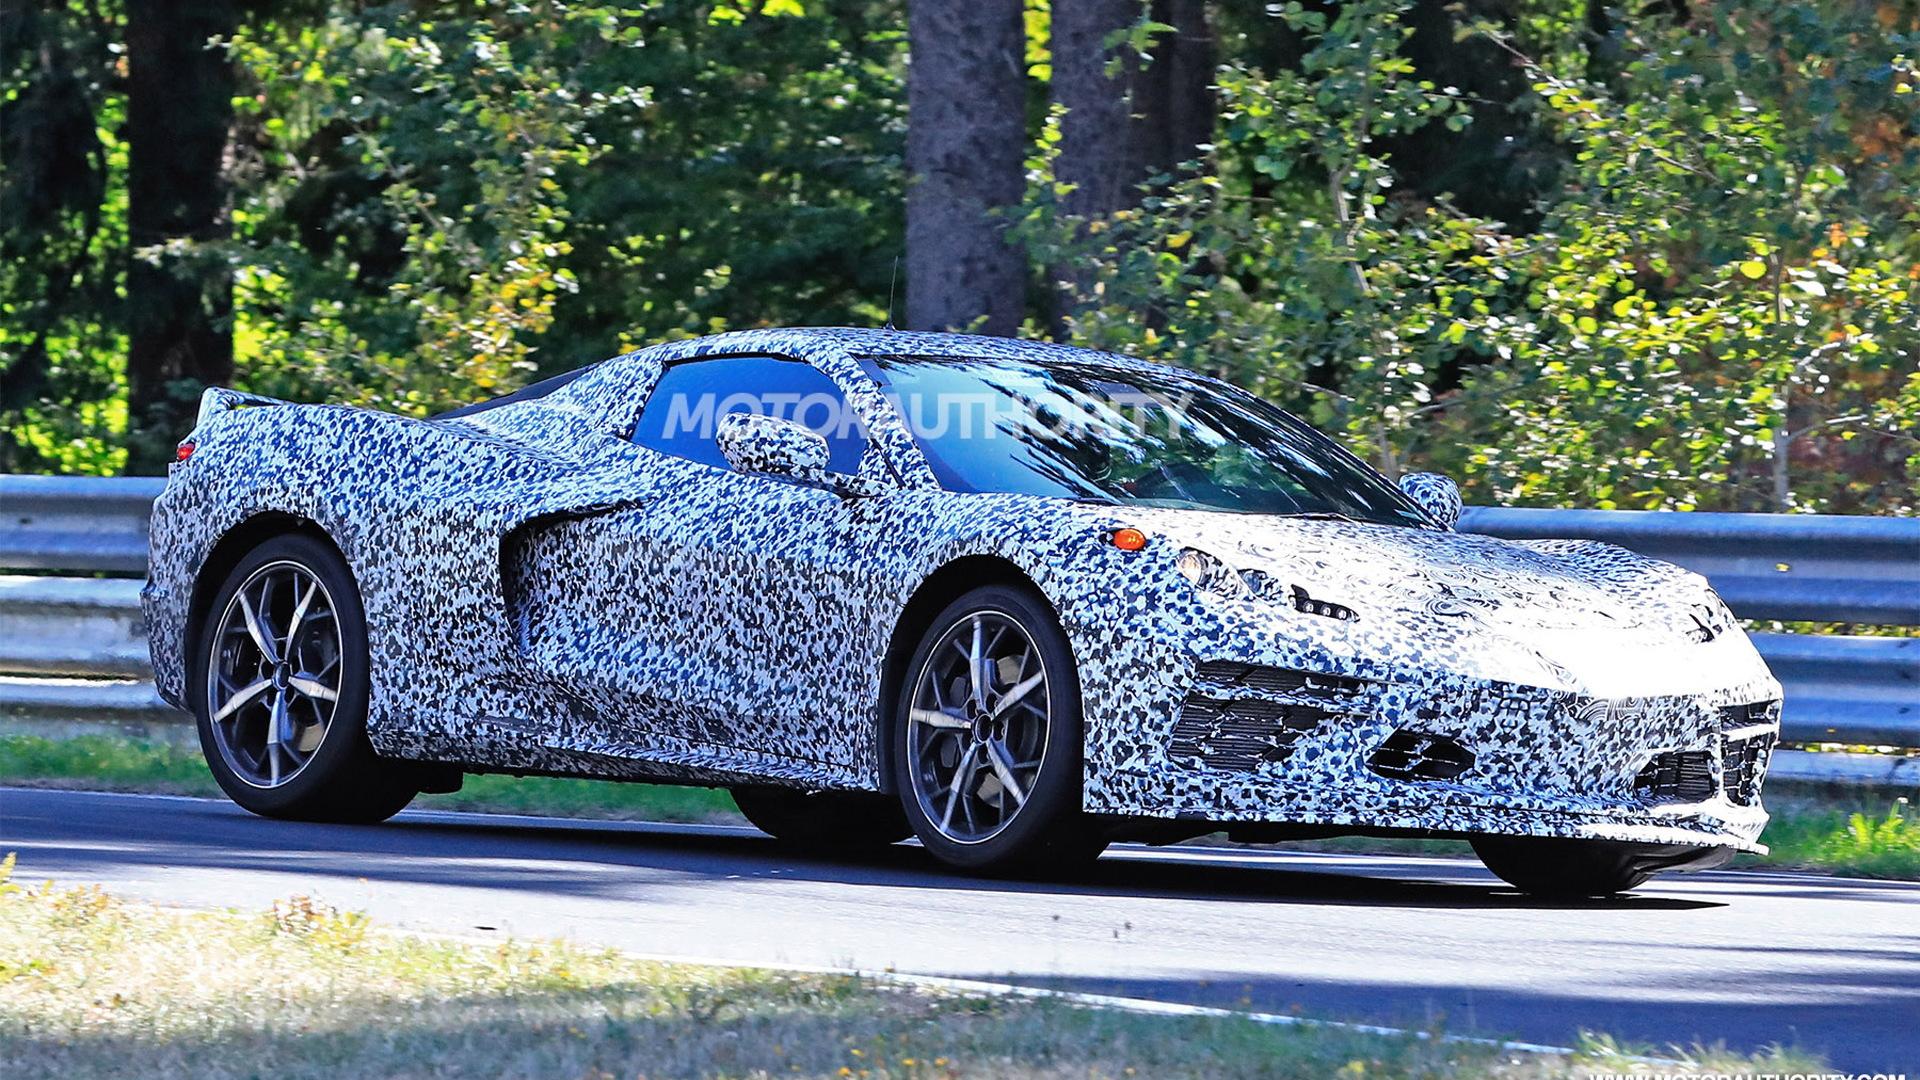 2020 corvette - photo #16